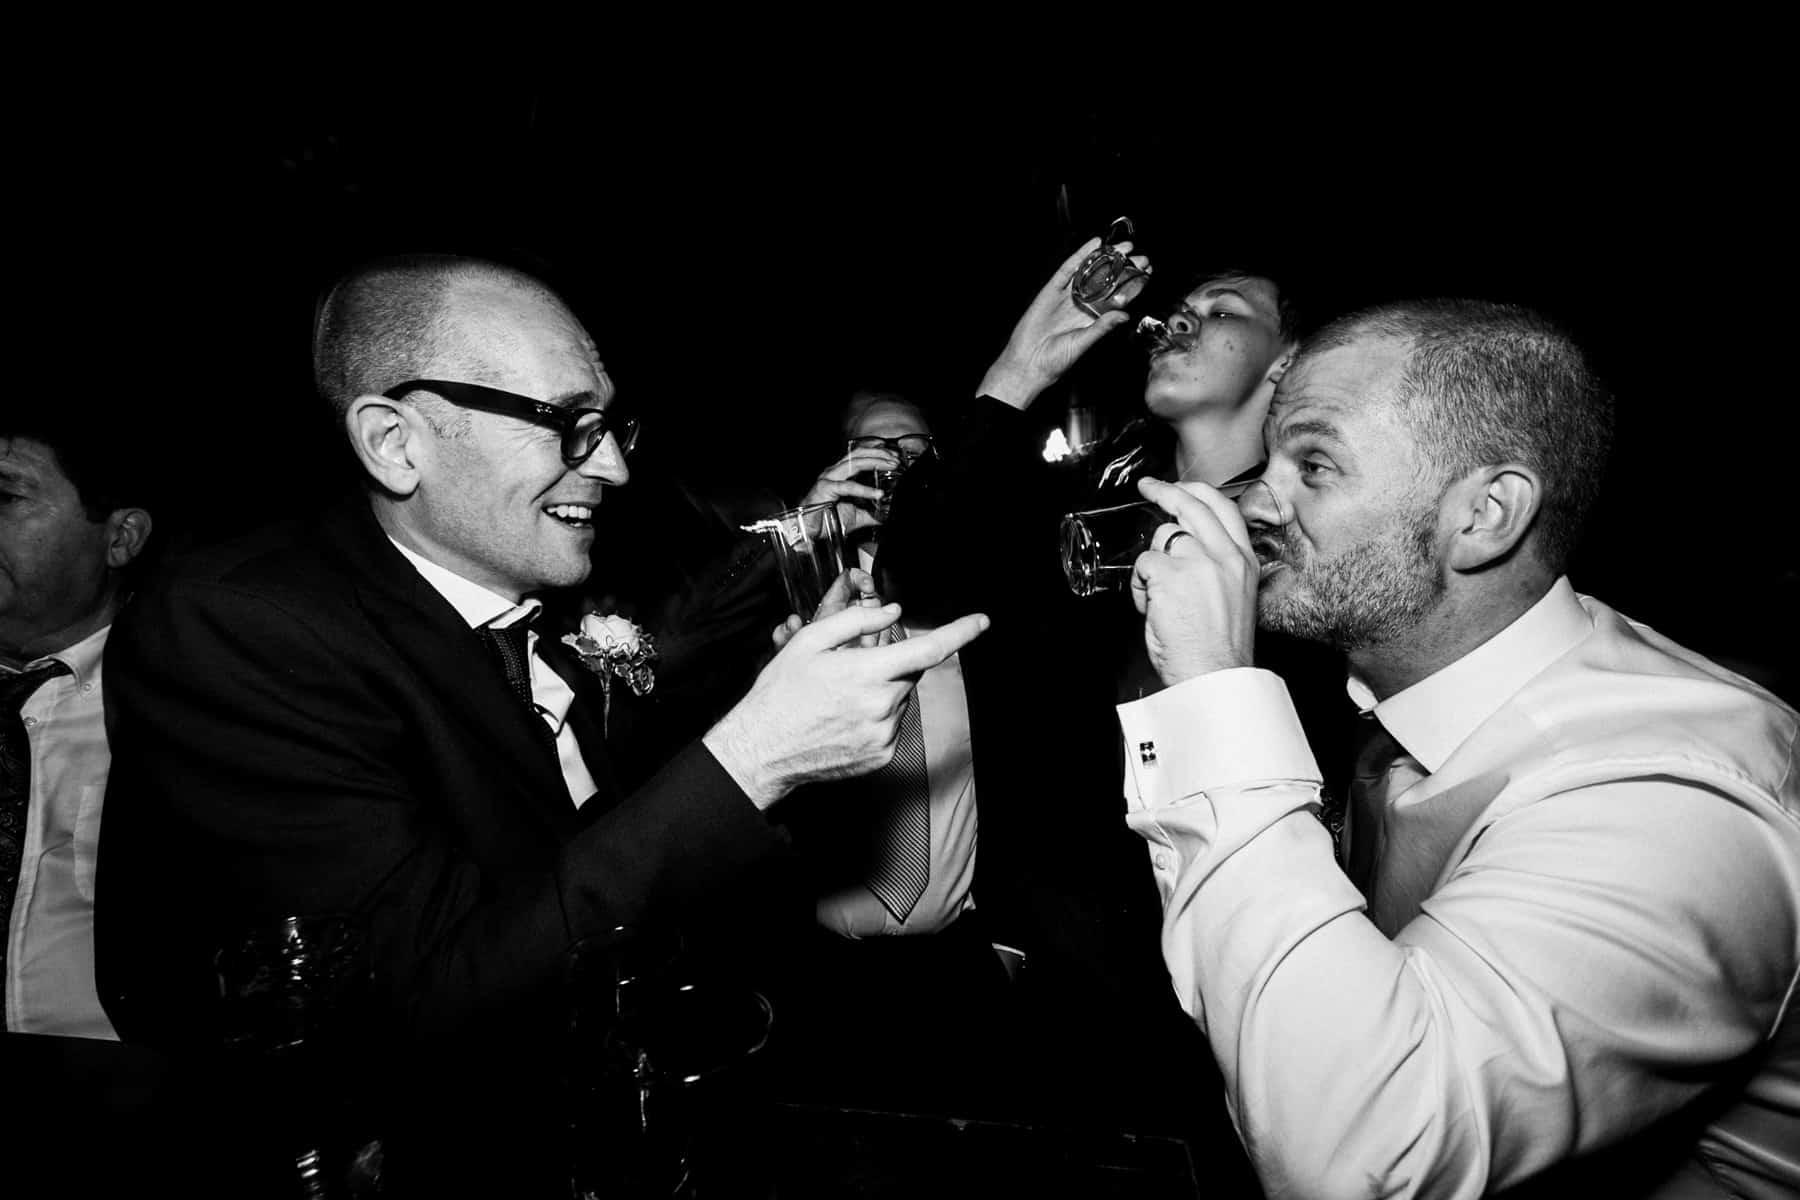 groom and ushers doing shots